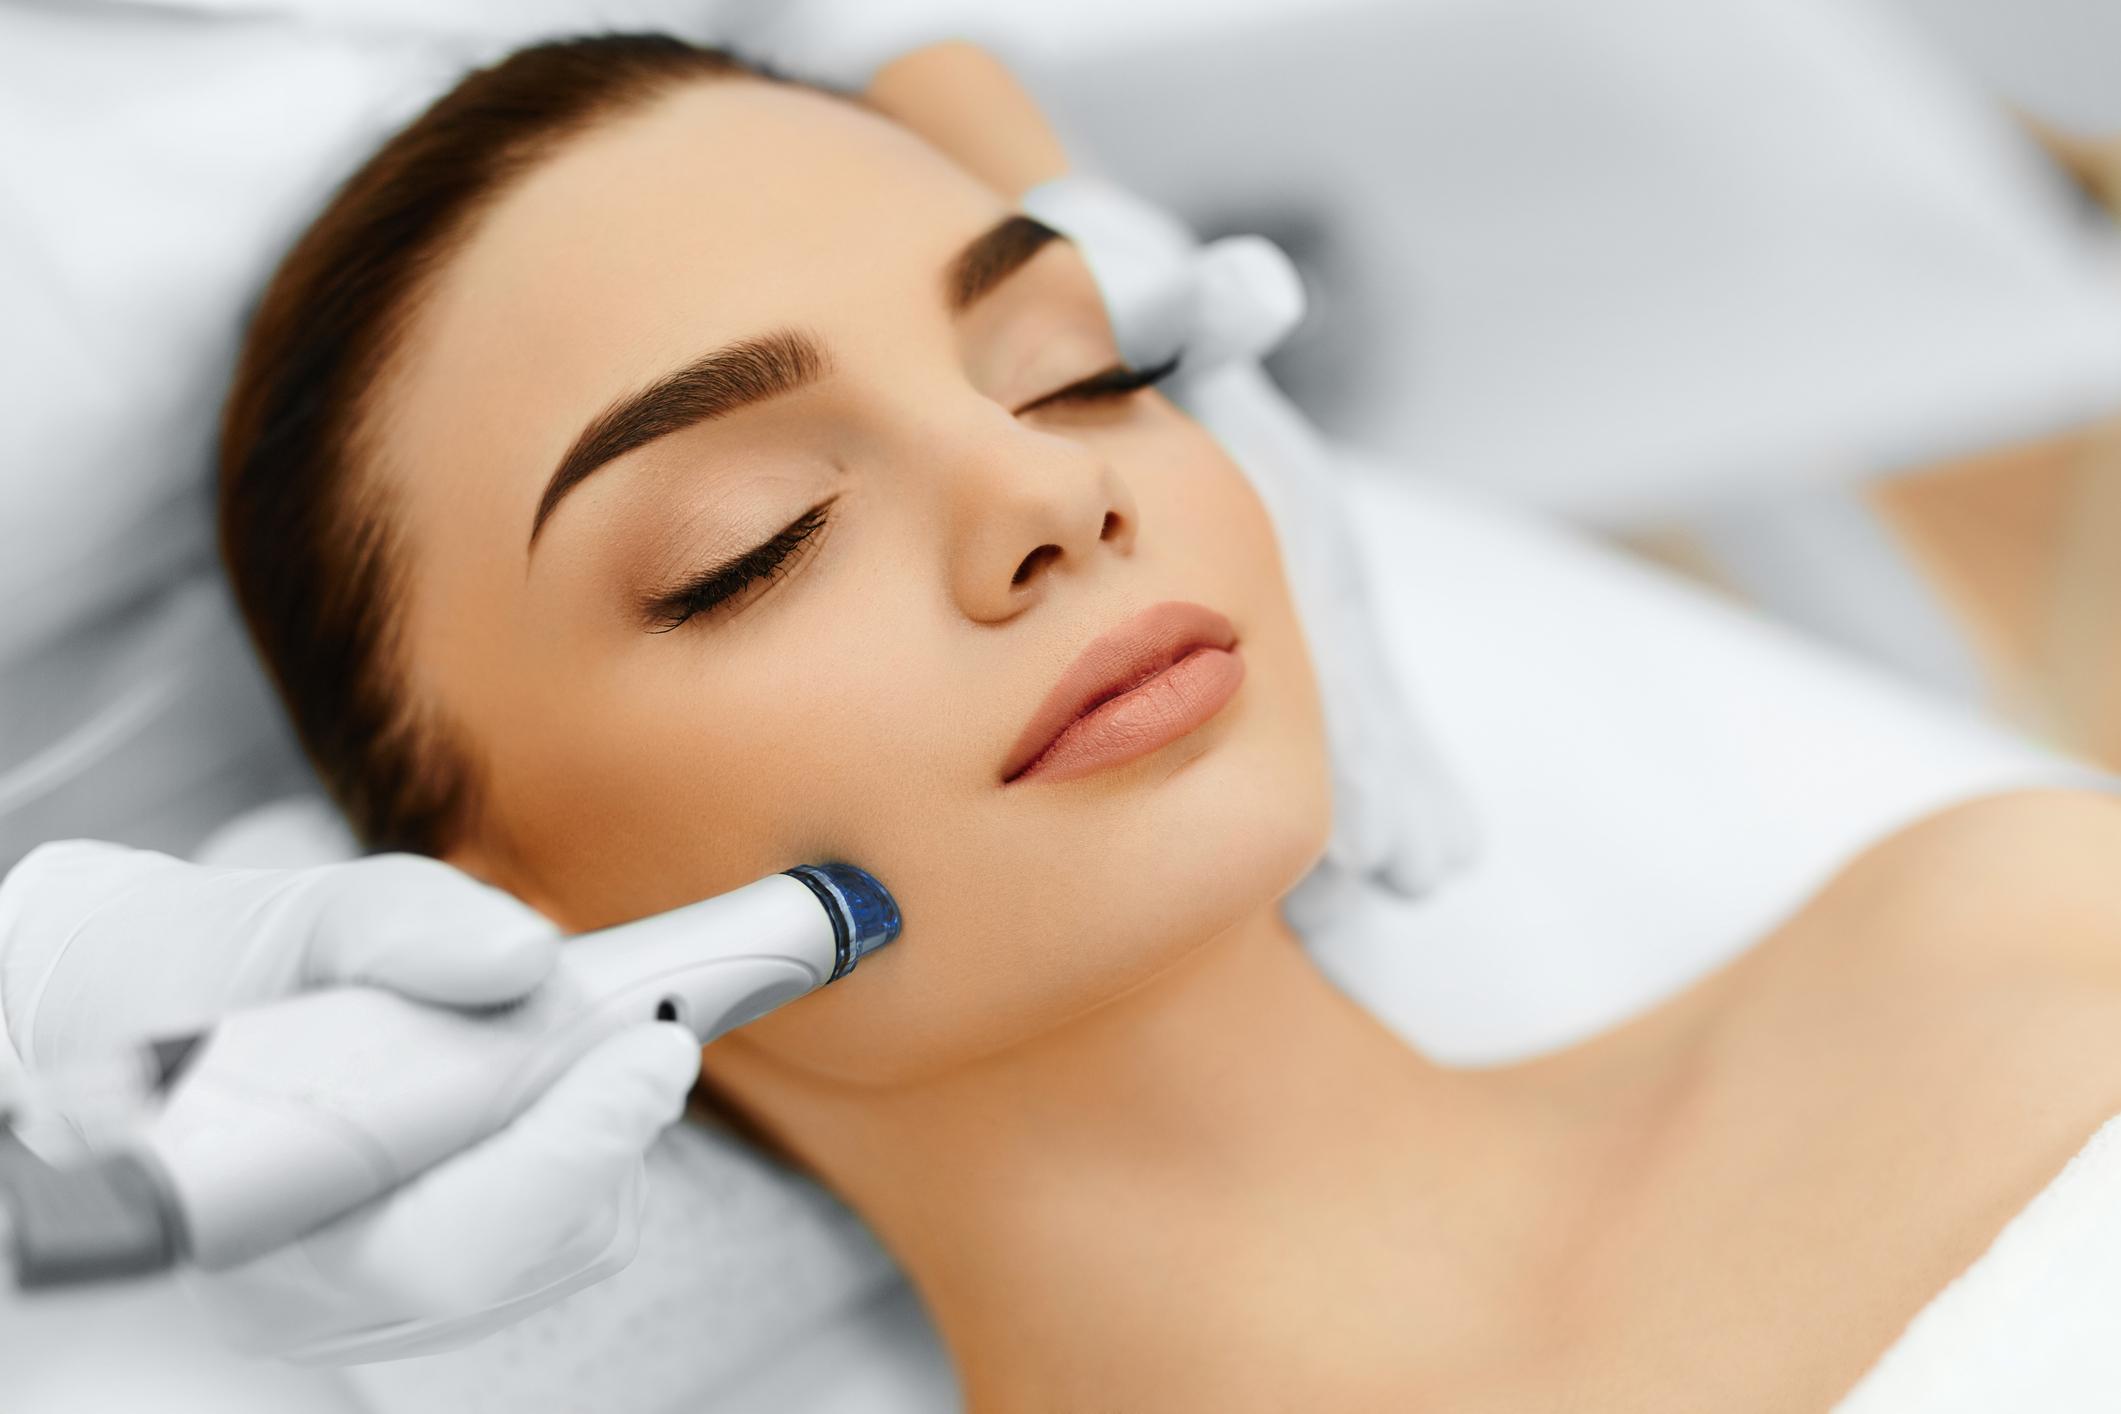 face-skin-care-facial-hydro-microdermabrasion-peeling-treatment-63738624.jpg